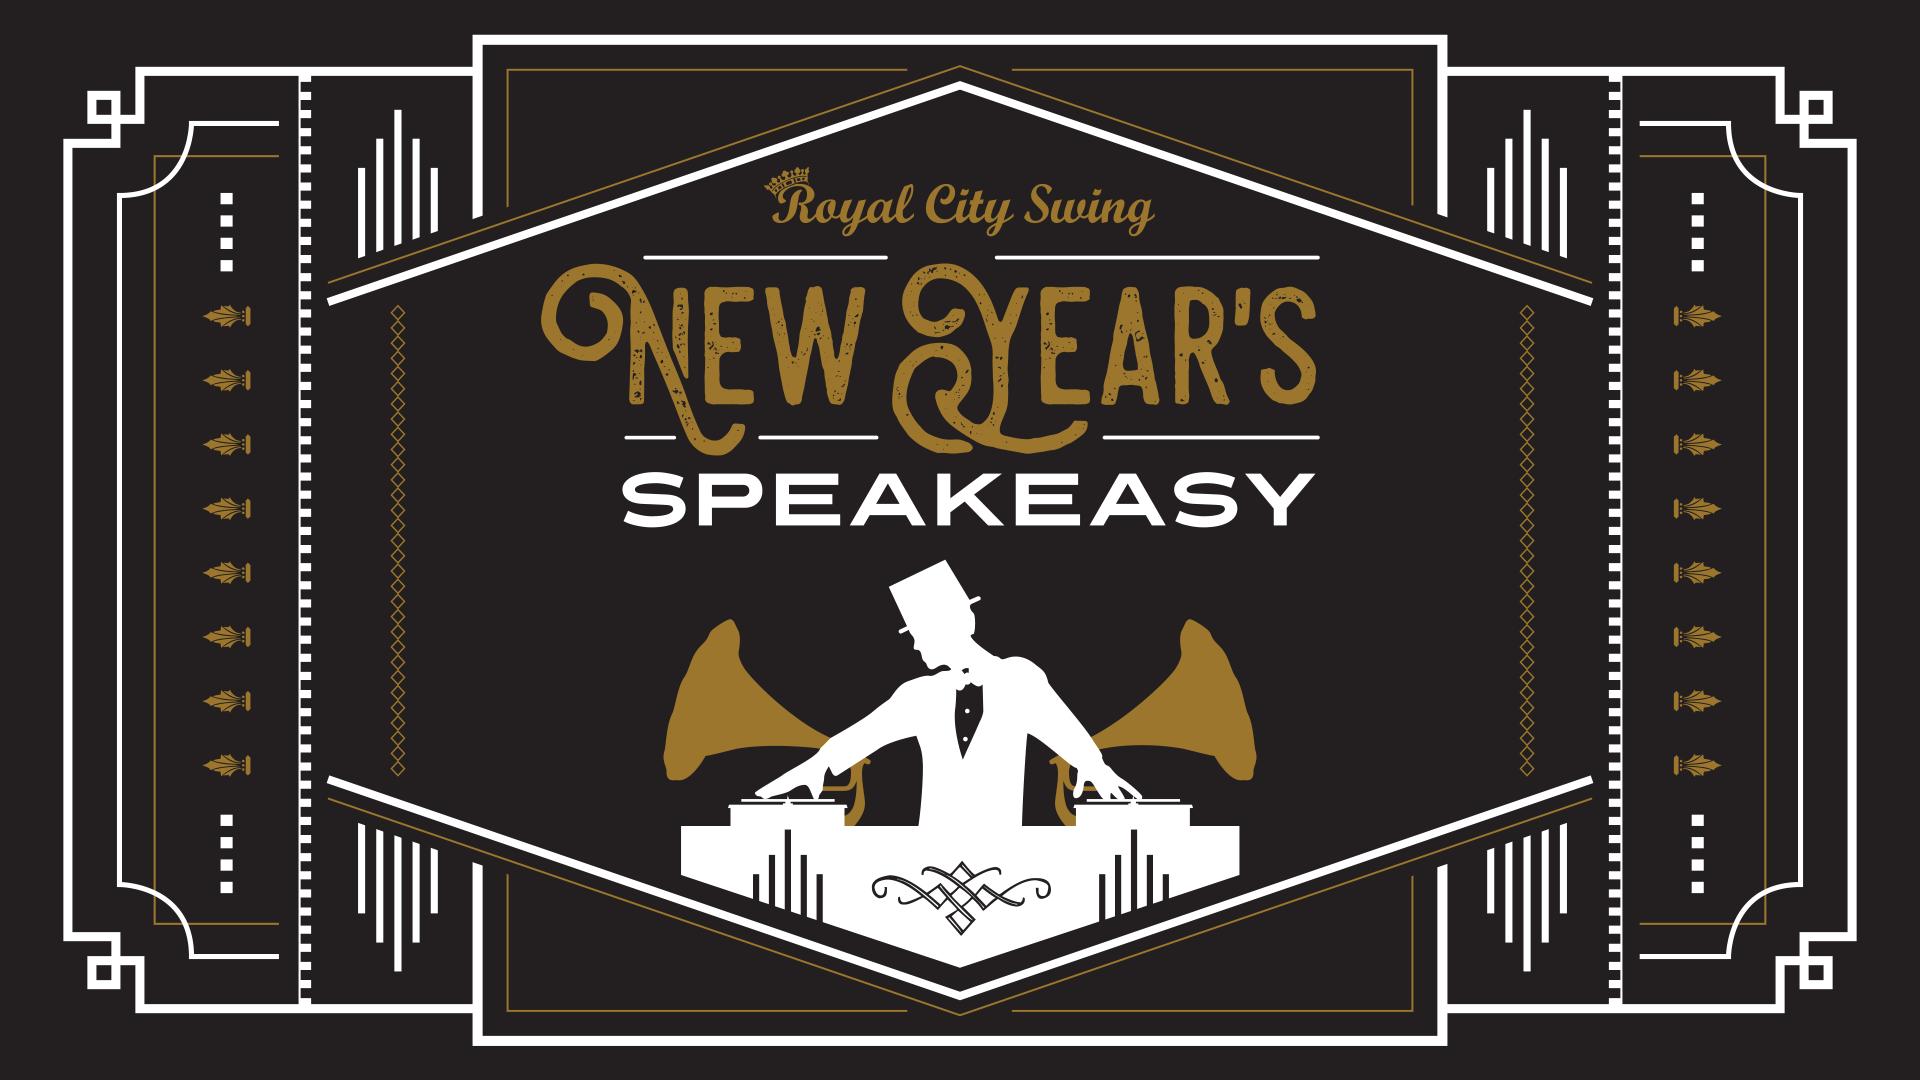 RCS-FB-NewYears-Speakeasy-1920x1080.png